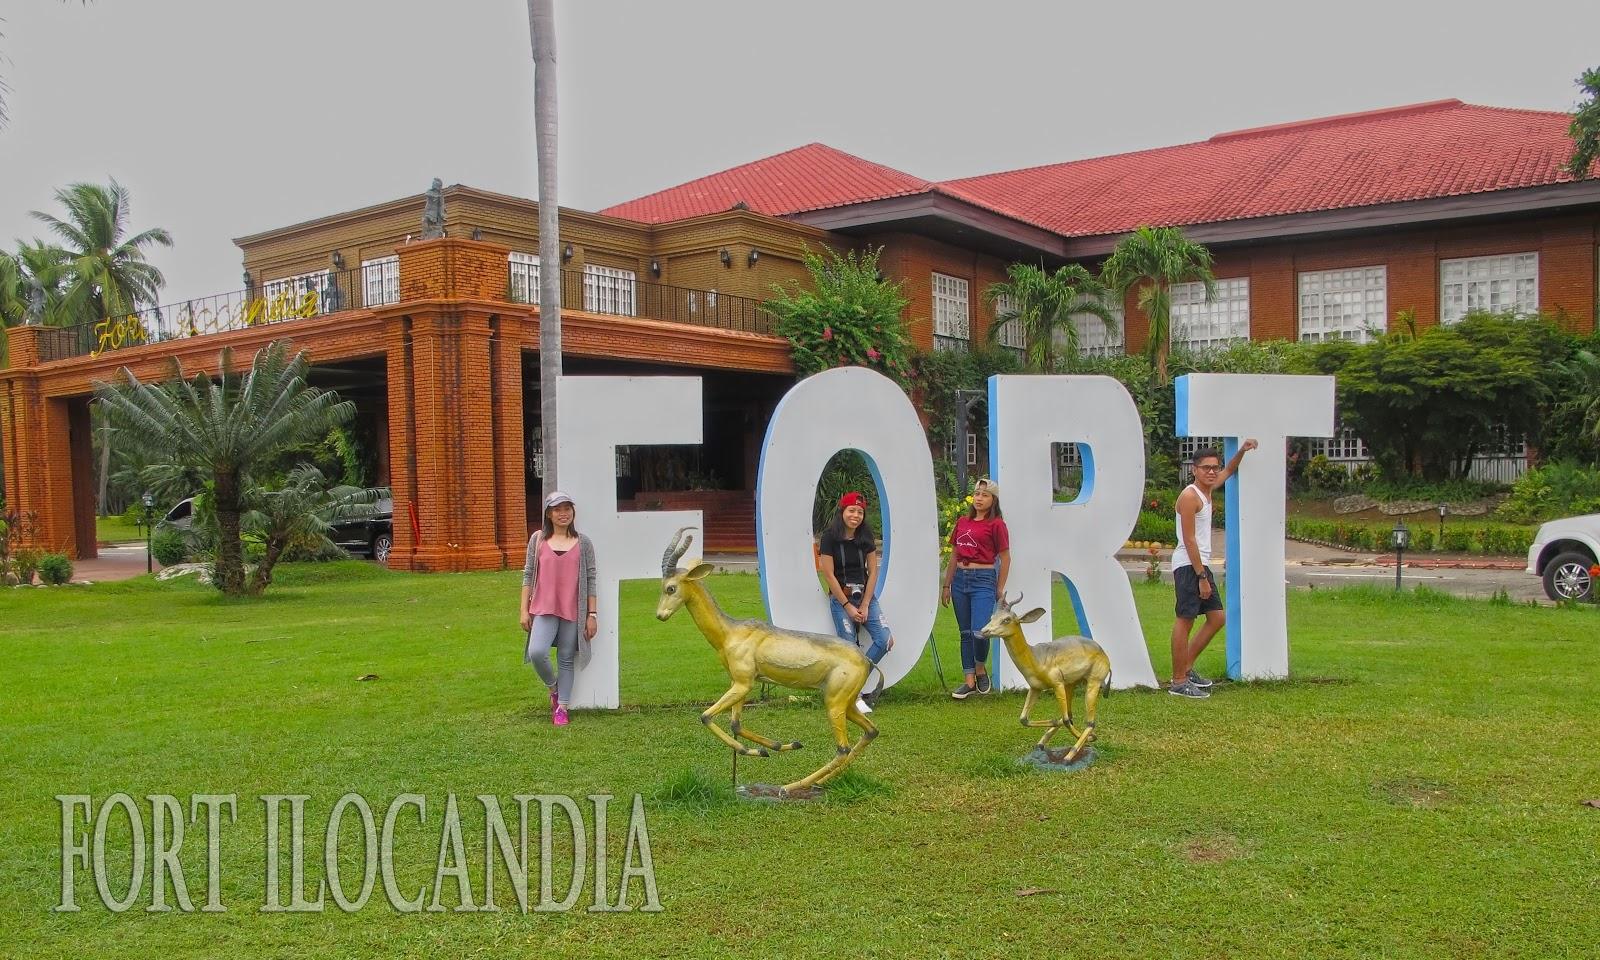 Fort Ilocandia Resort and Casino